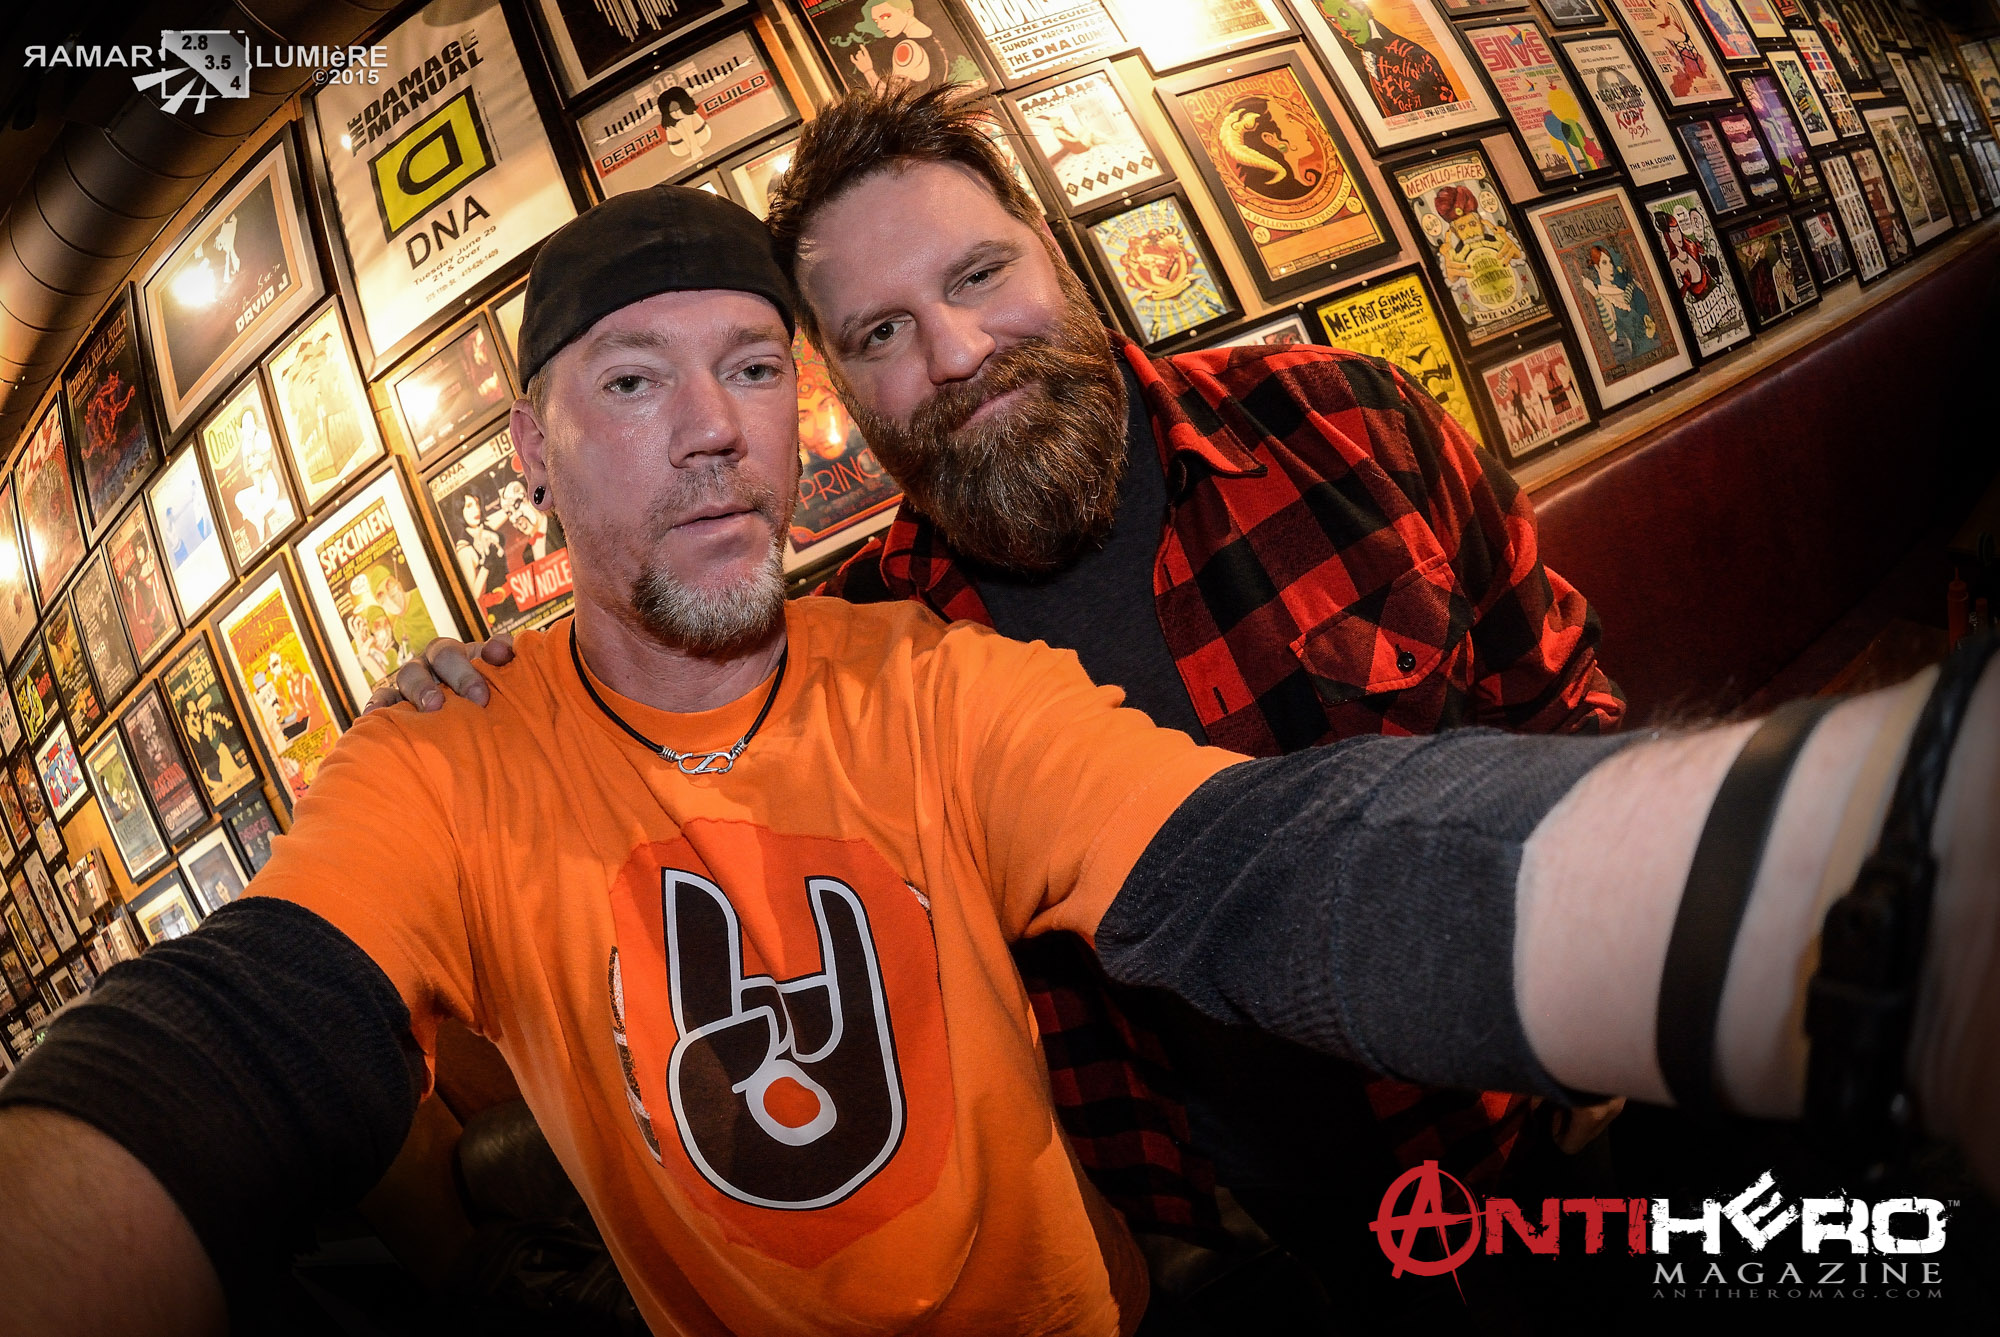 Brock Lindow with Greg RaMar - 36 Crazyfists